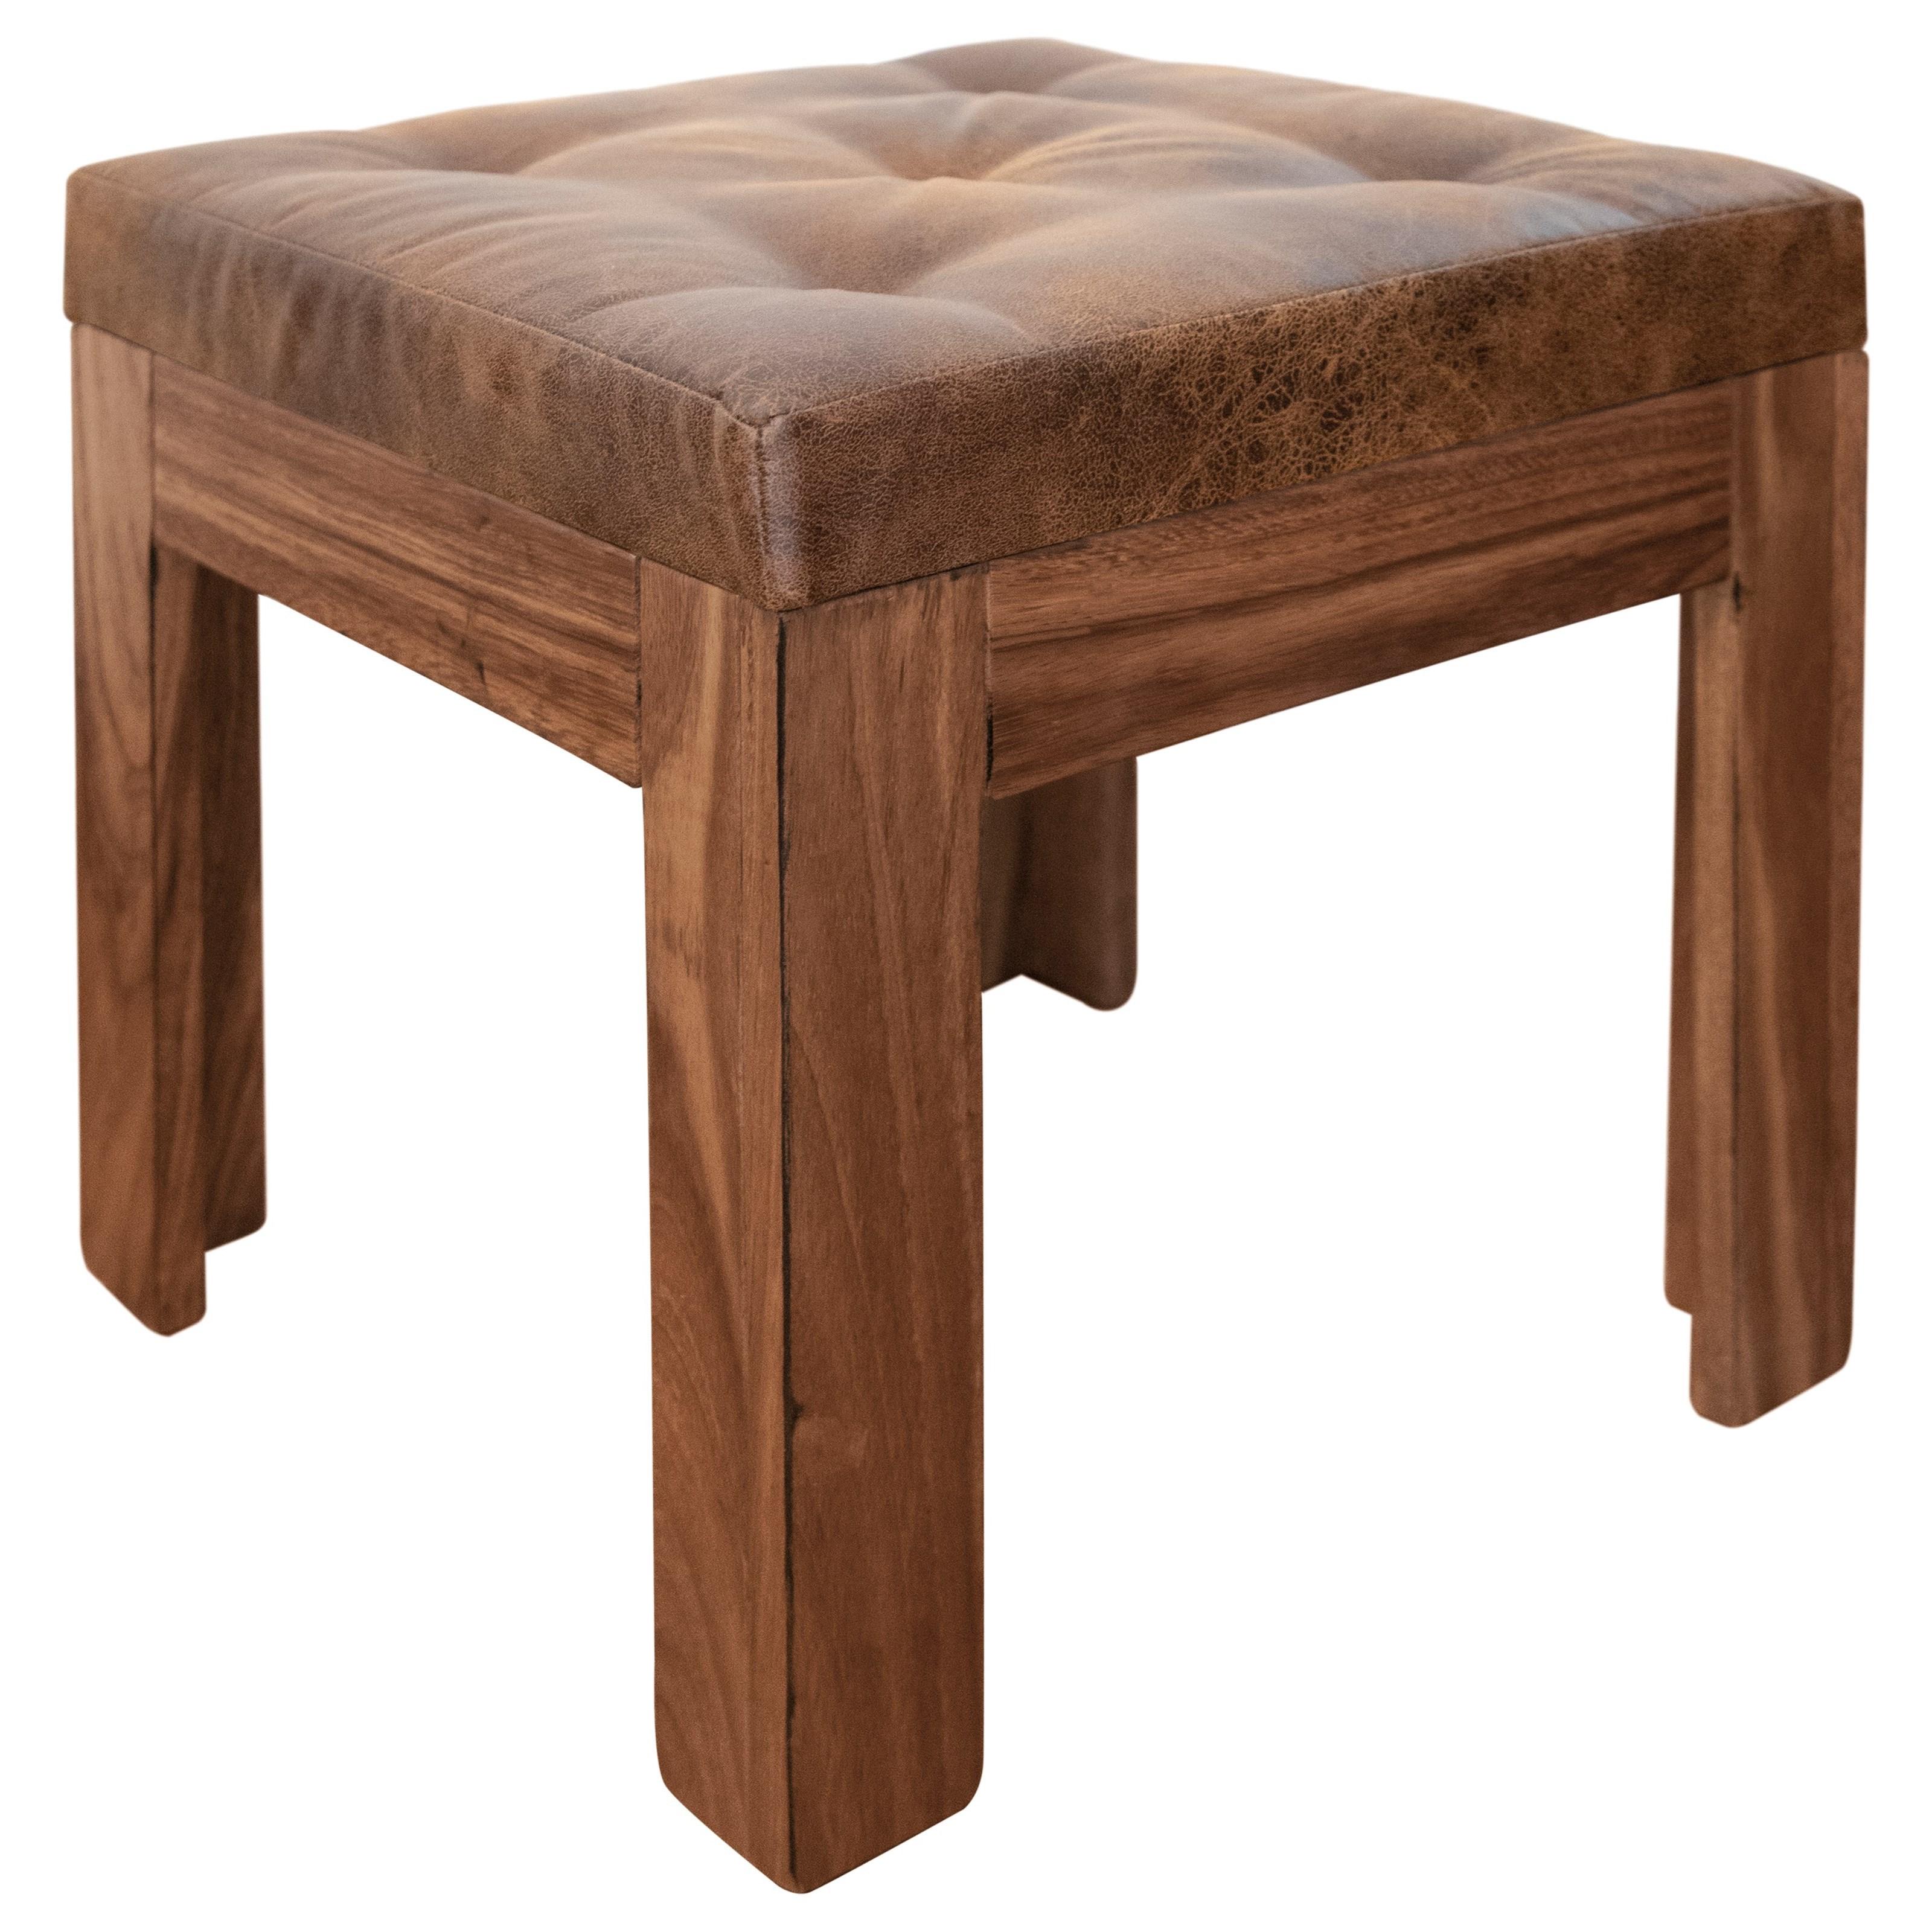 Parota Stool by VFM Signature at Virginia Furniture Market